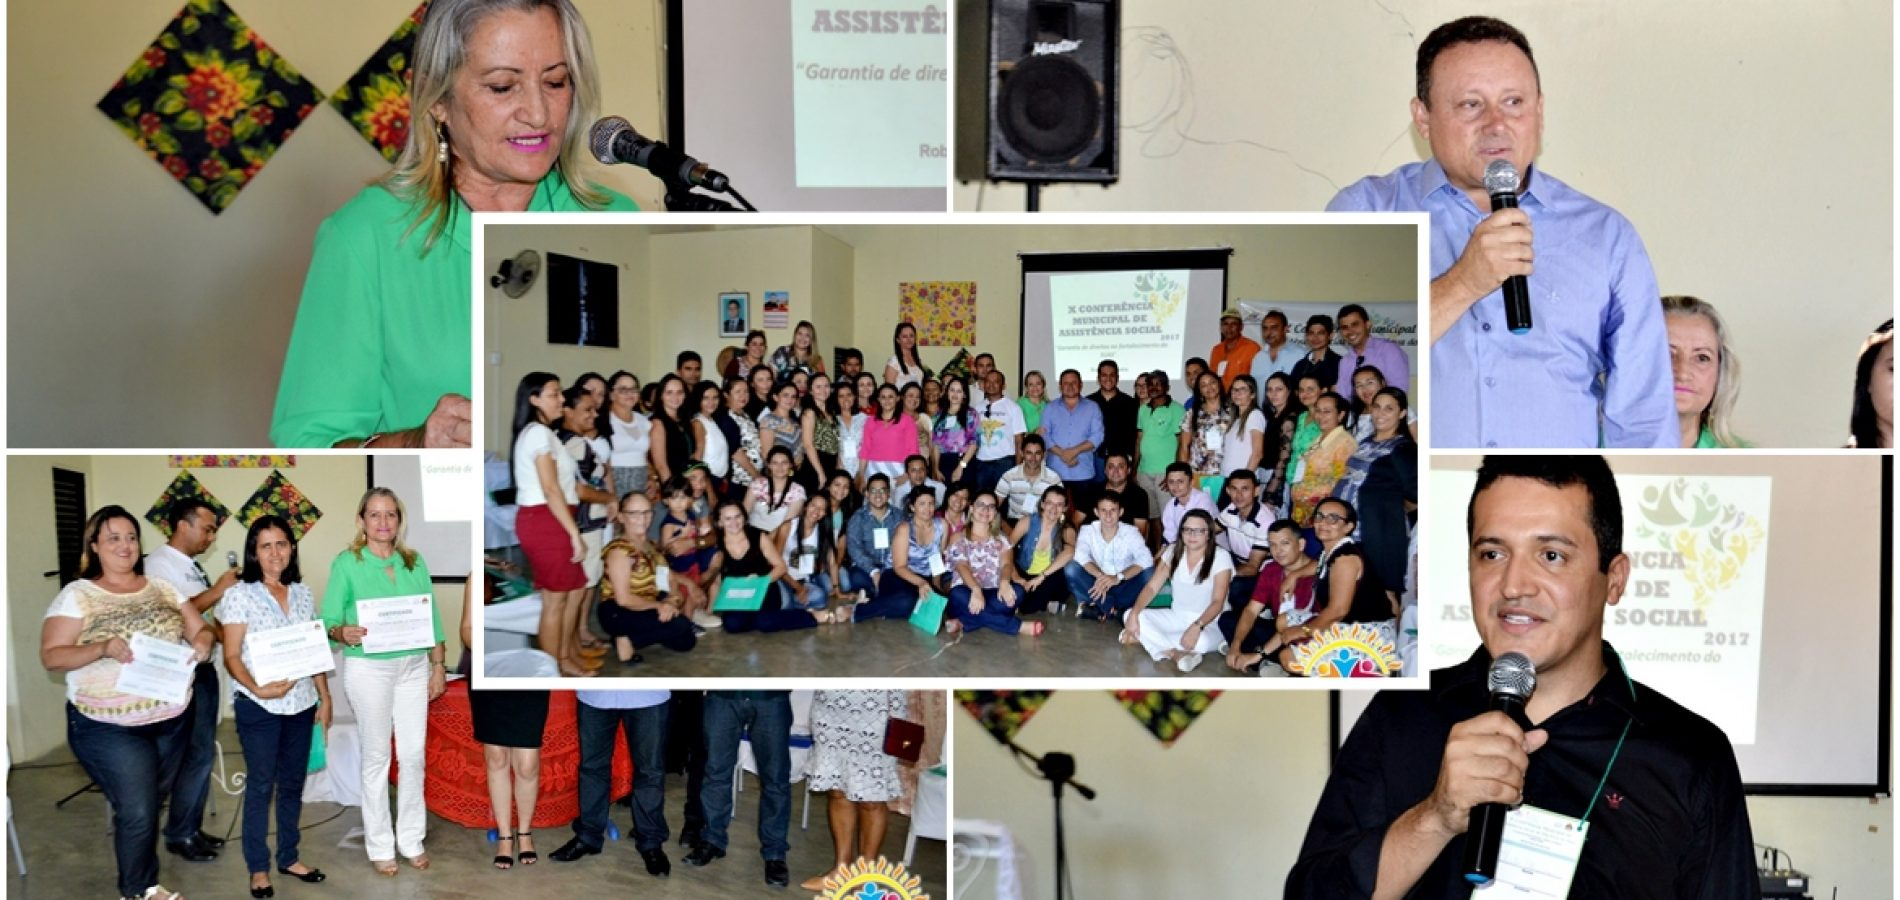 Vila Nova realiza a X Conferência Municipal de Assistência Social; veja fotos!